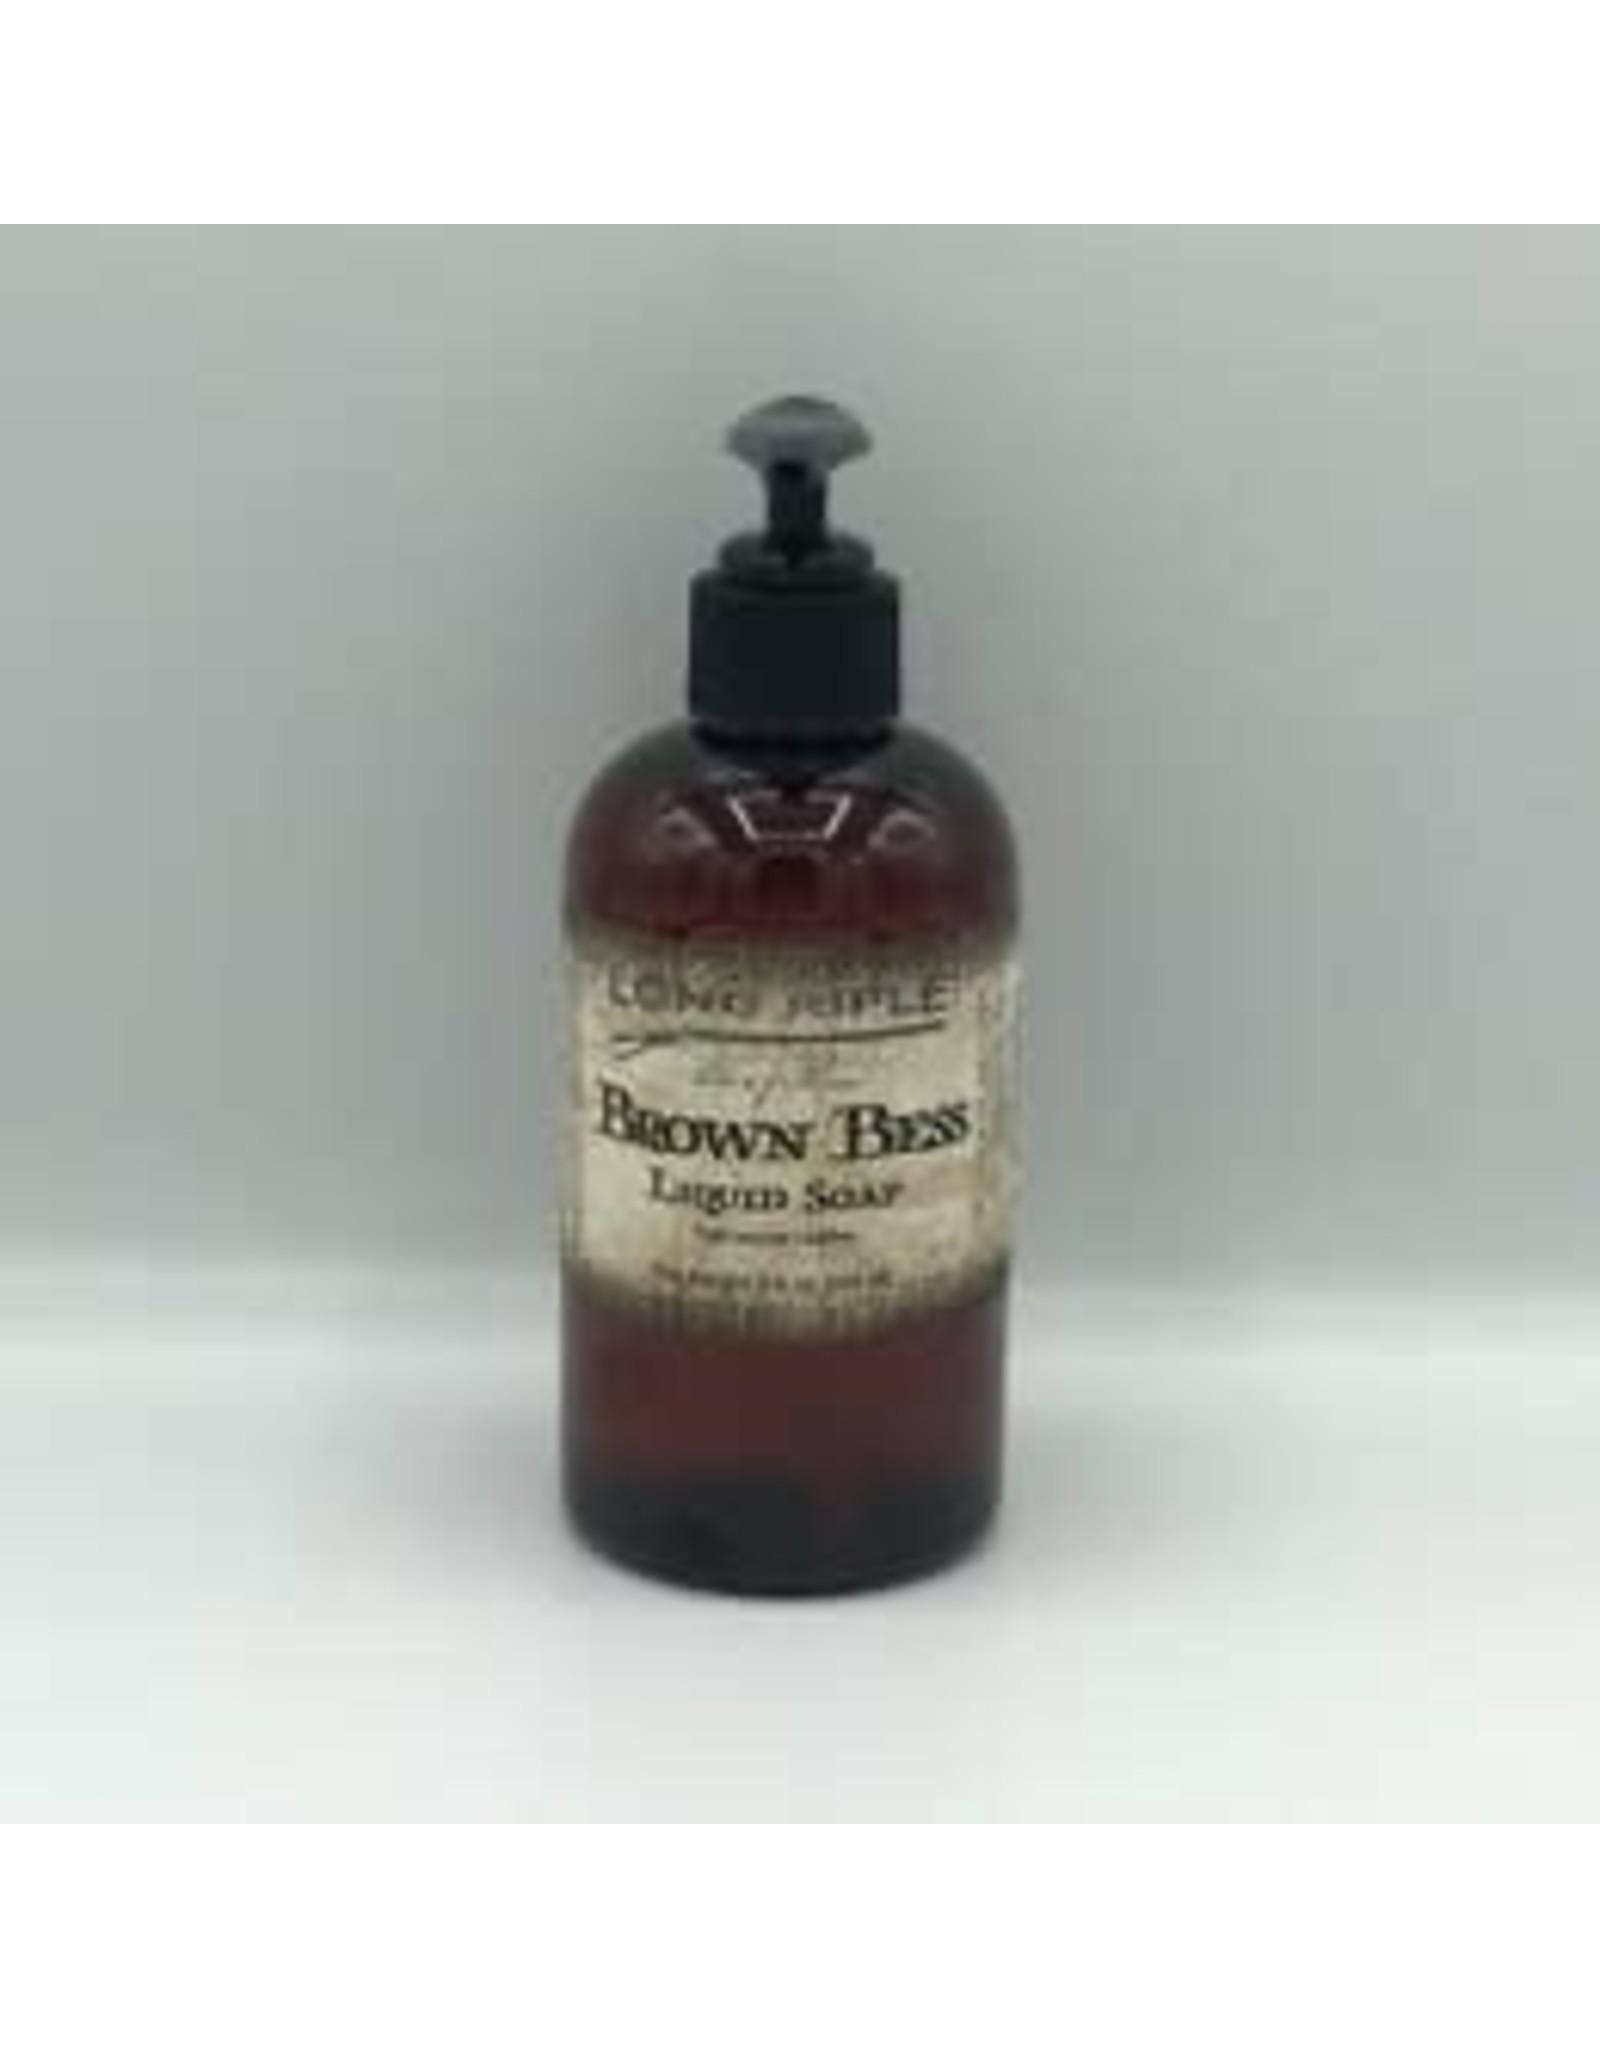 Long Rifle Men's Liquid Soap - Brown Bess